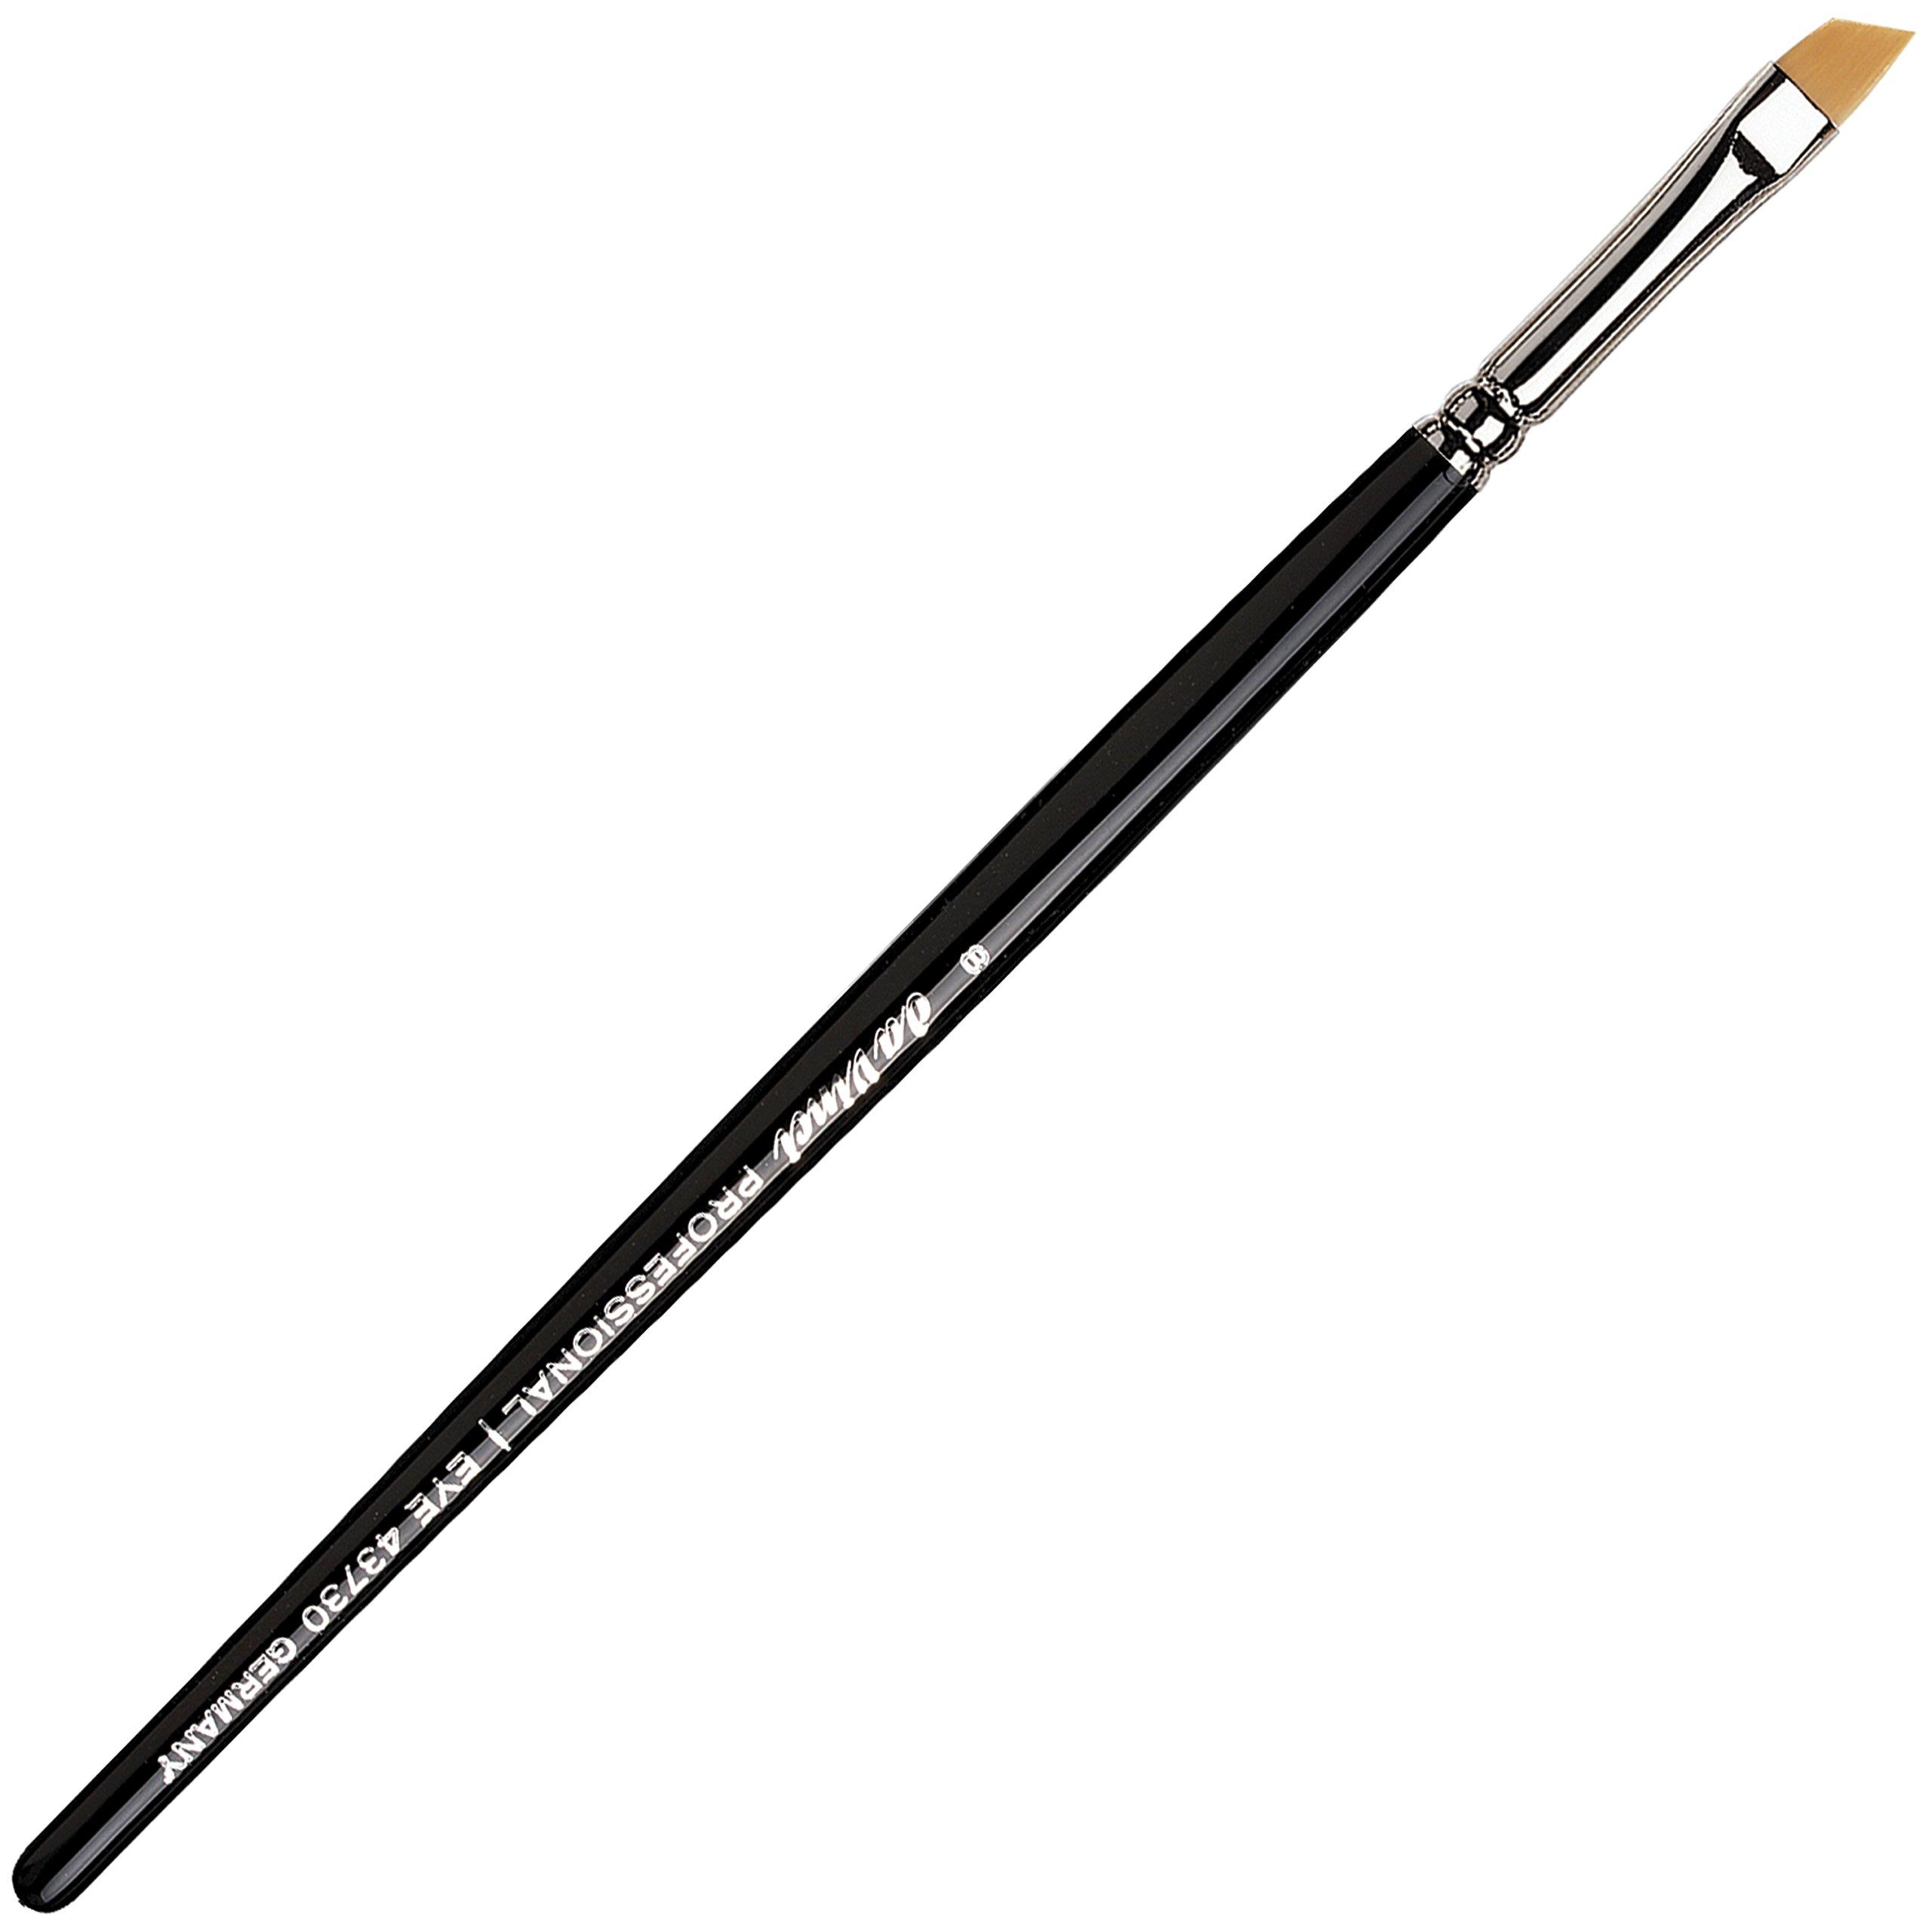 da Vinci Cosmetics Series 43730 Professional Eyeliner Brush, Angled Synthetic, Size 8, 10.4 Gram